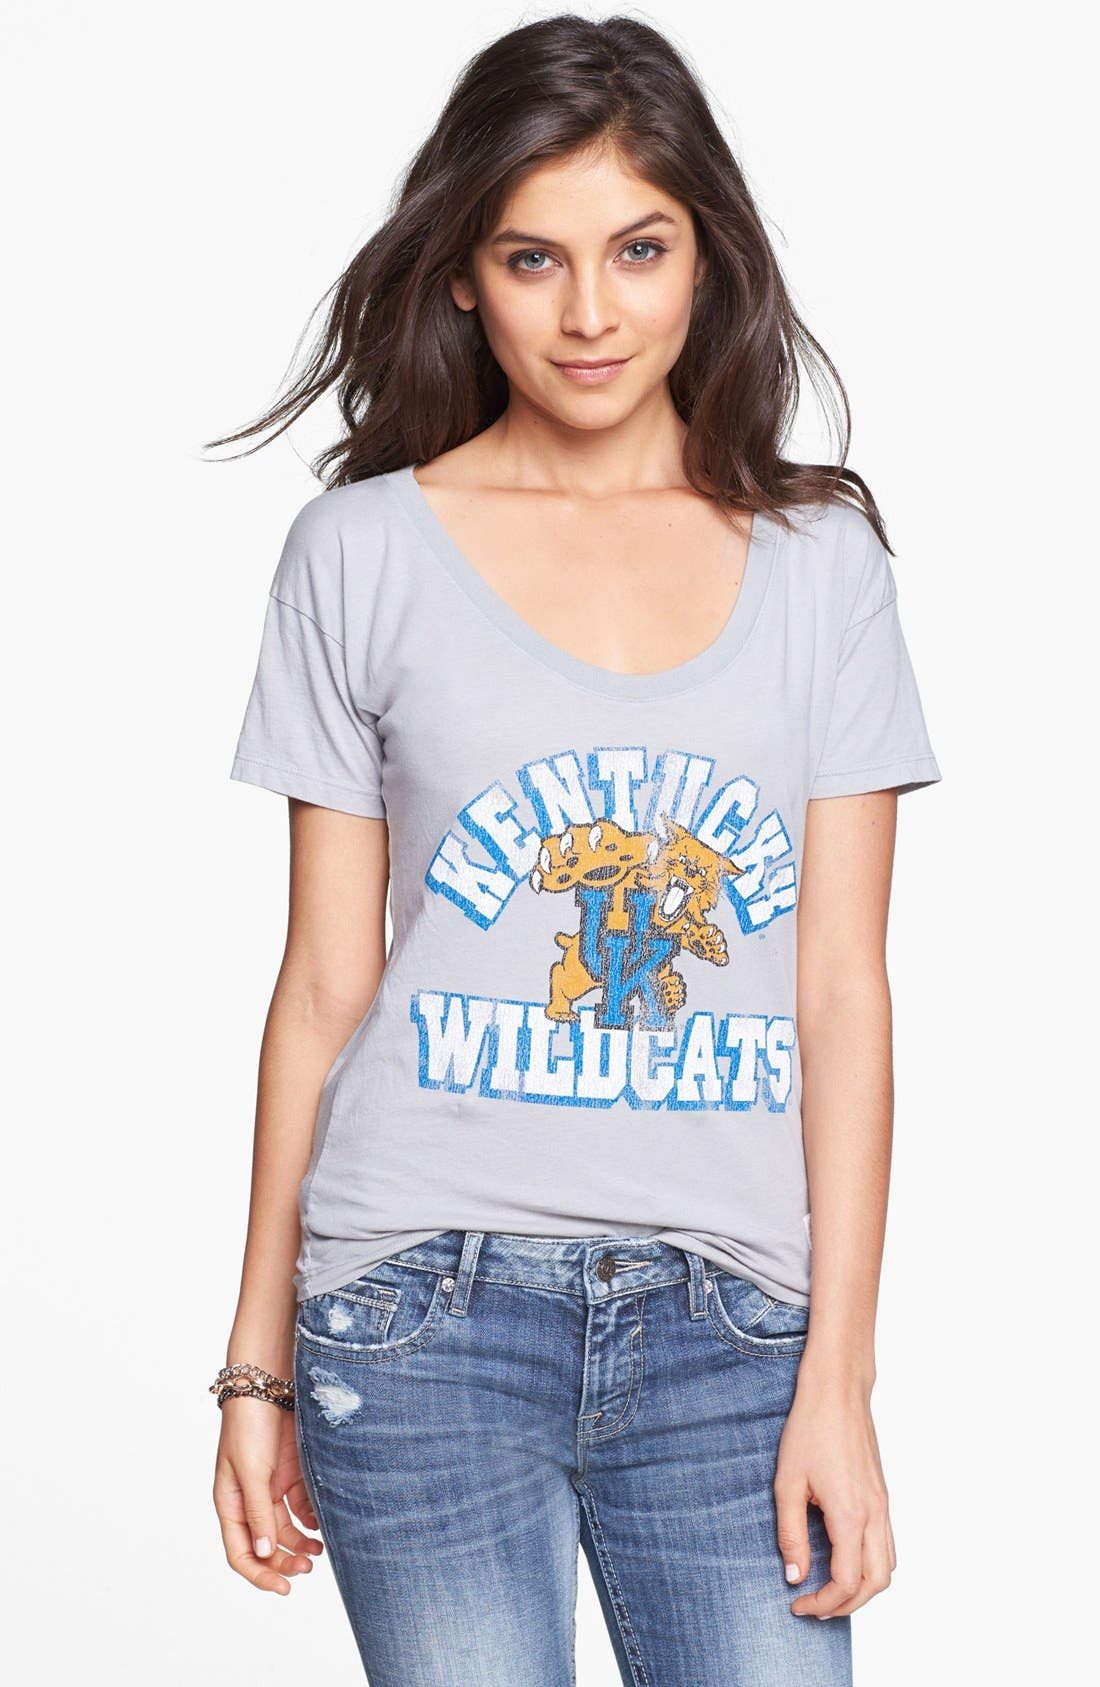 Alternate Image 1 Selected - Retro Brand 'University of Kentucky Wildcats' Graphic Tee (Juniors)